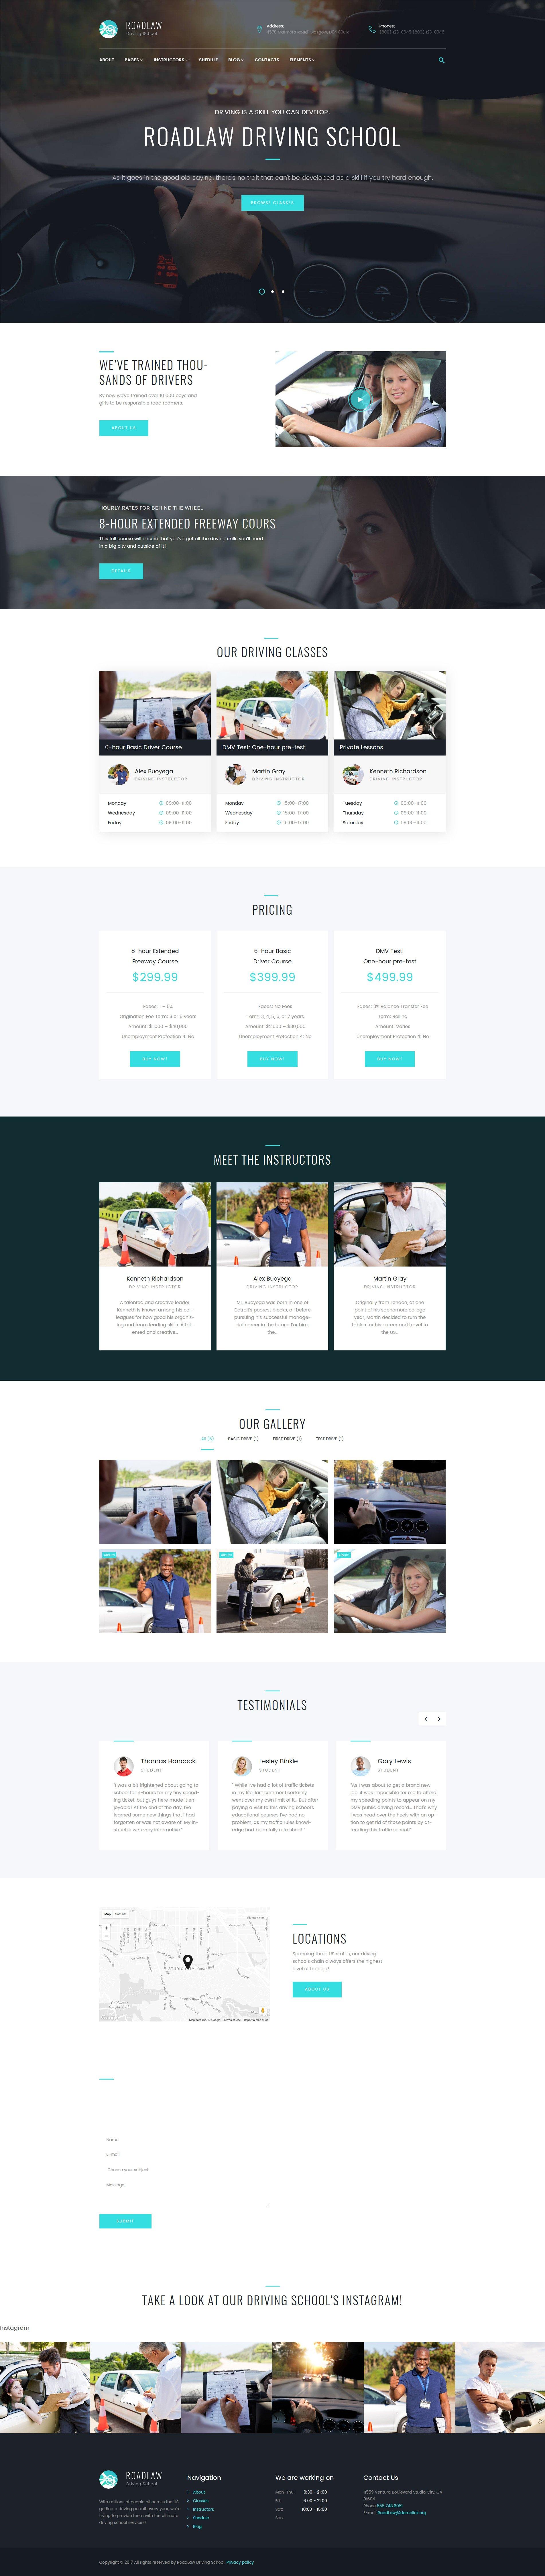 RoadLaw - Driving School Responsive WordPress Theme Tema WordPress №63631